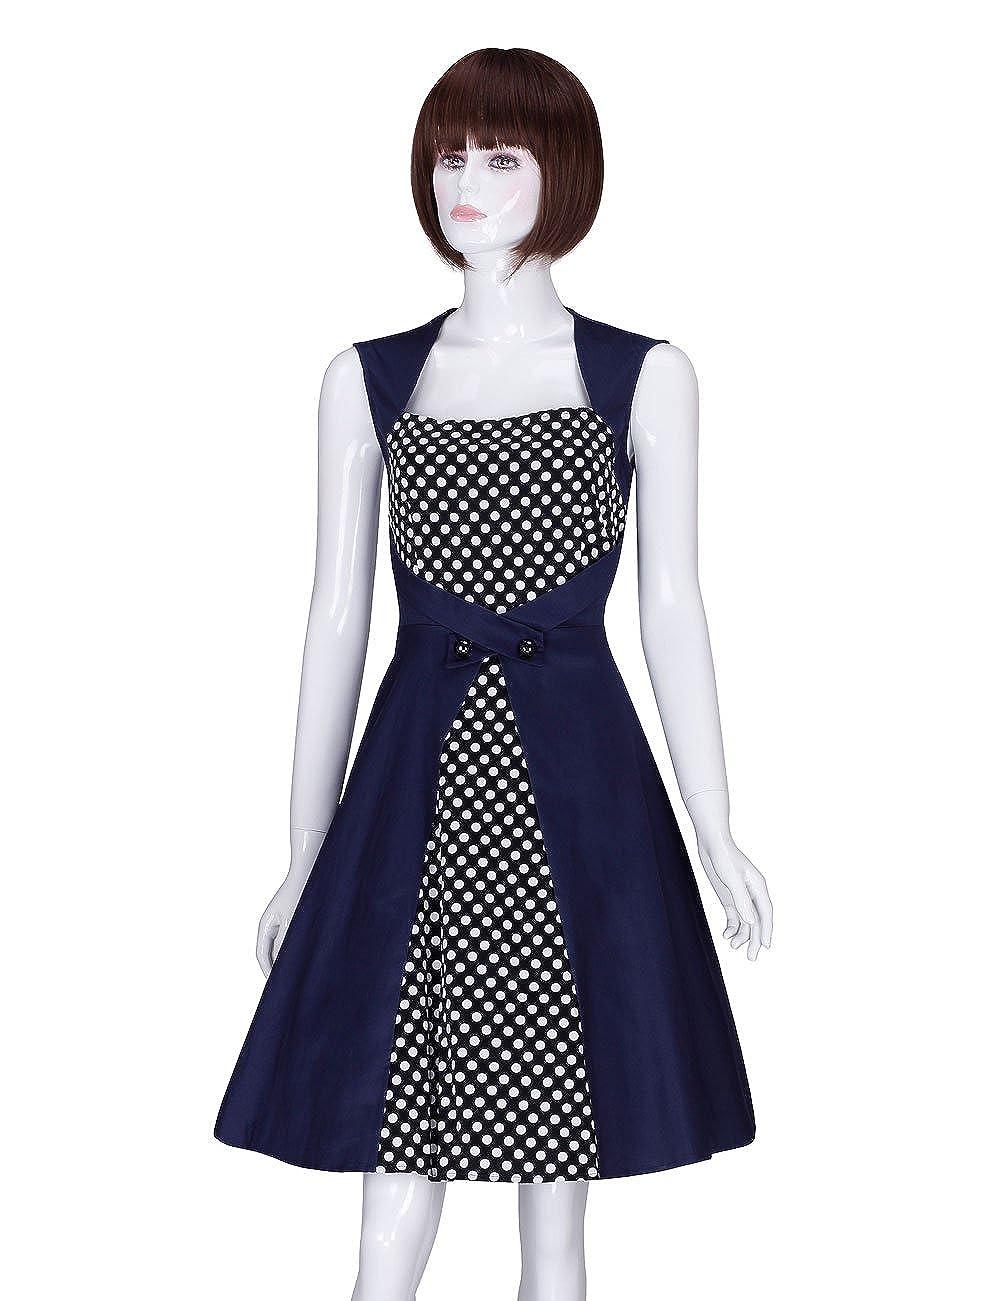 b298aa152c68 Top1: Aurora Adamaris Women\'s Vintage Classical Slim Polka Dots Sleeveless  Casual Swing Dress